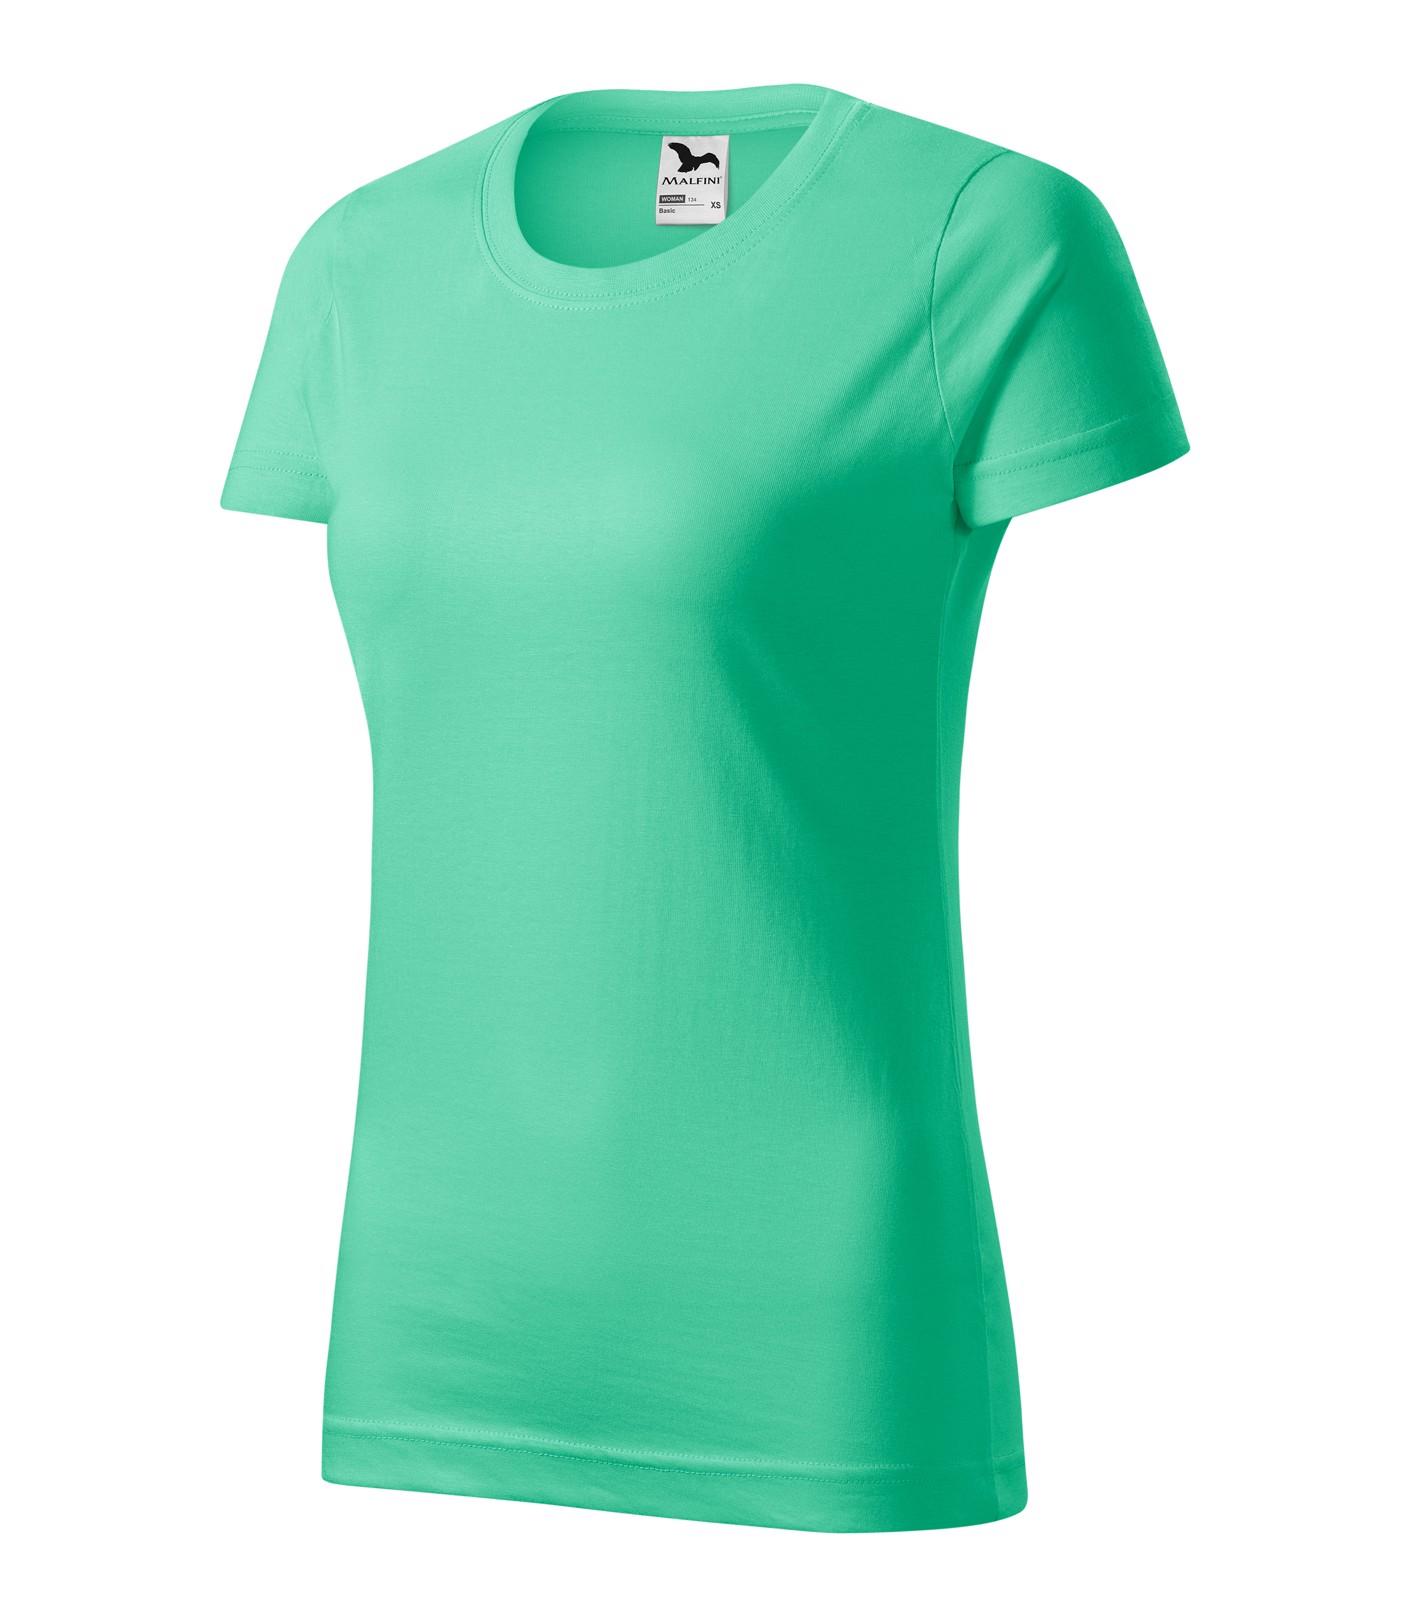 T-shirt women's Malfini Basic - Mint / S